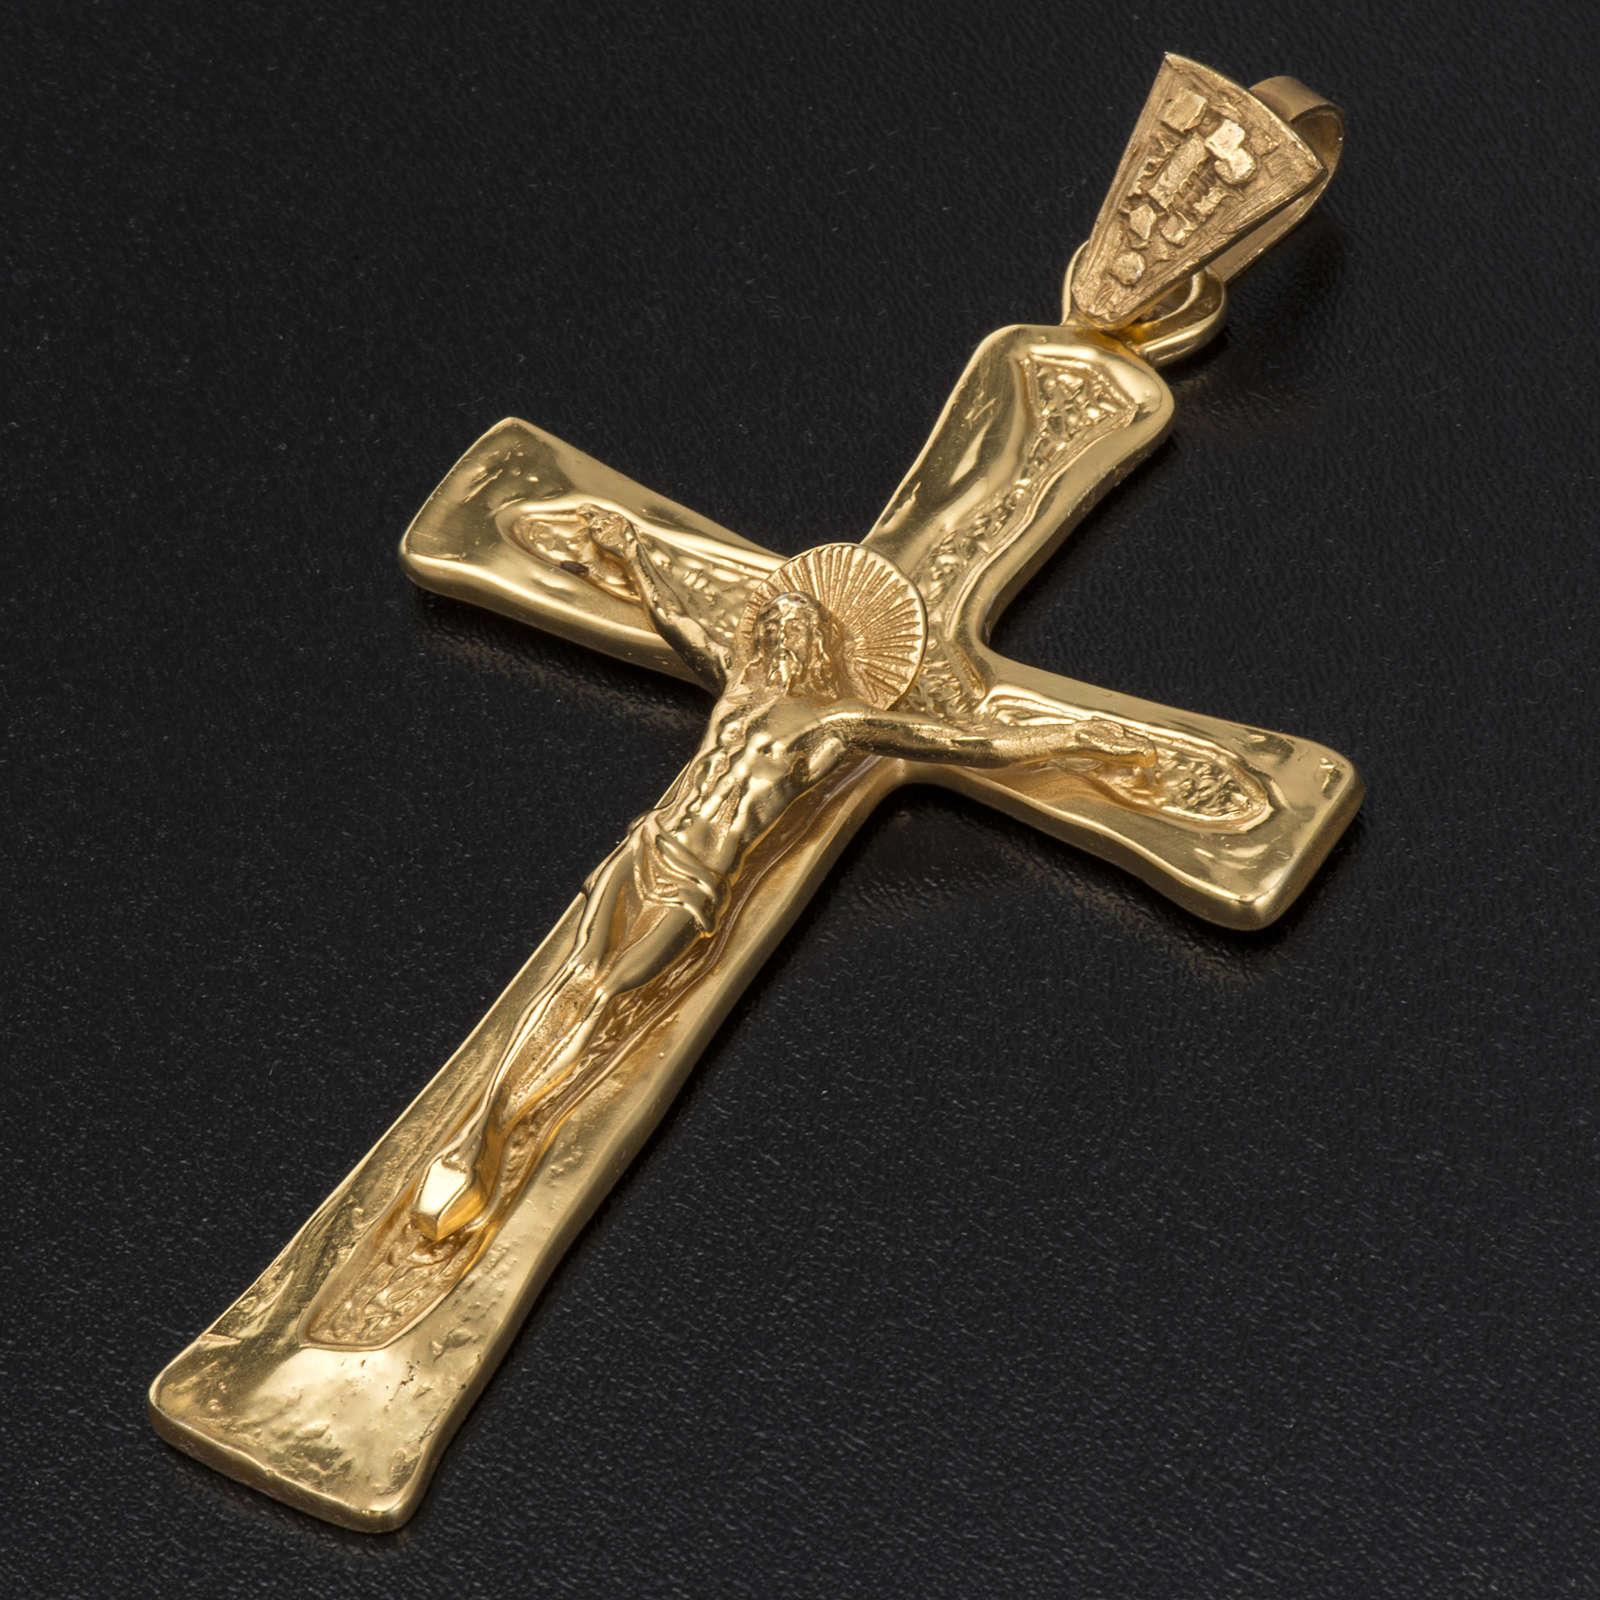 Cruz pectoral plata 925 dorada 3